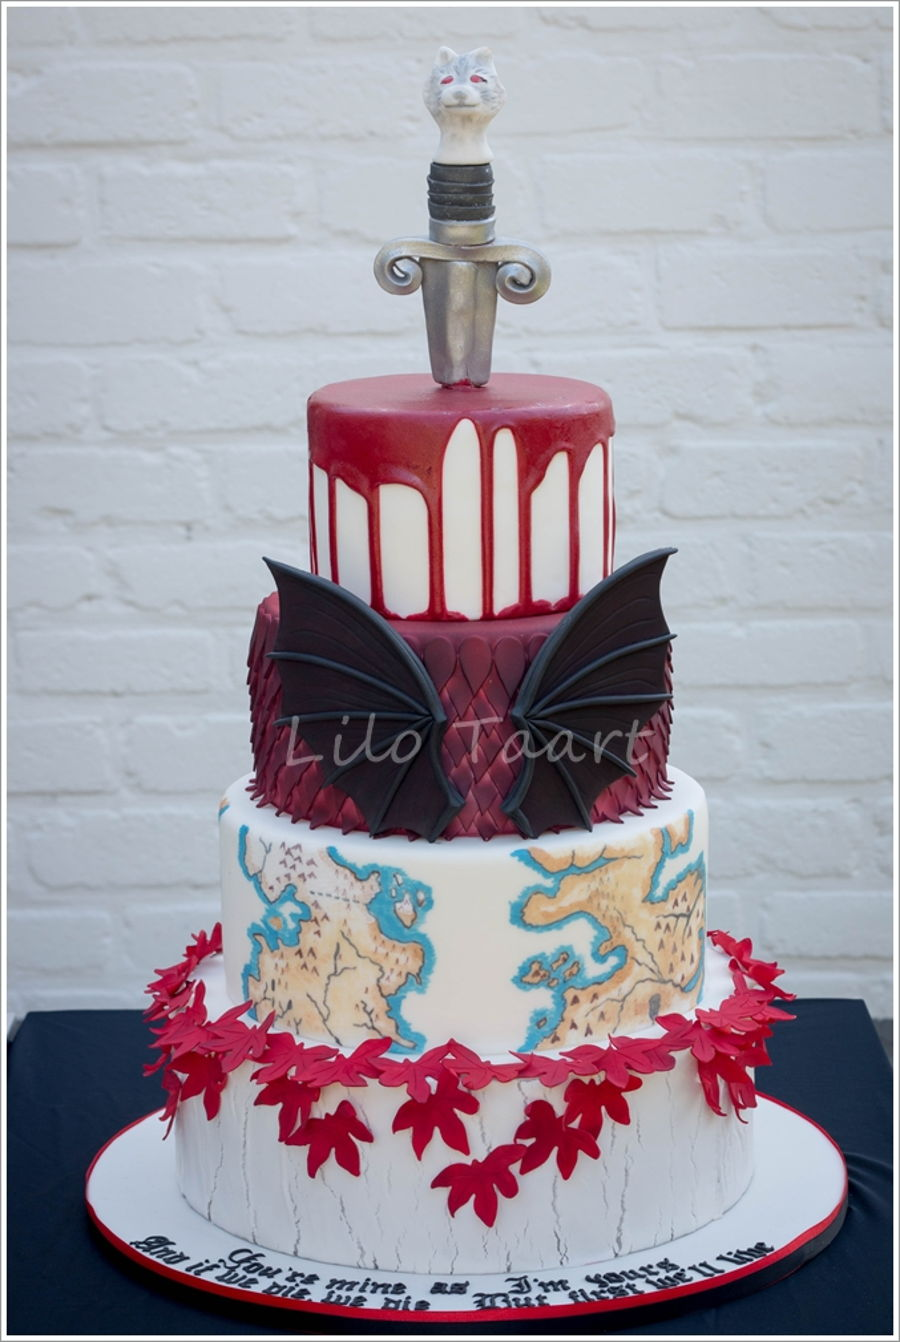 Game Of Thrones Wedding Cake Cakecentral Com